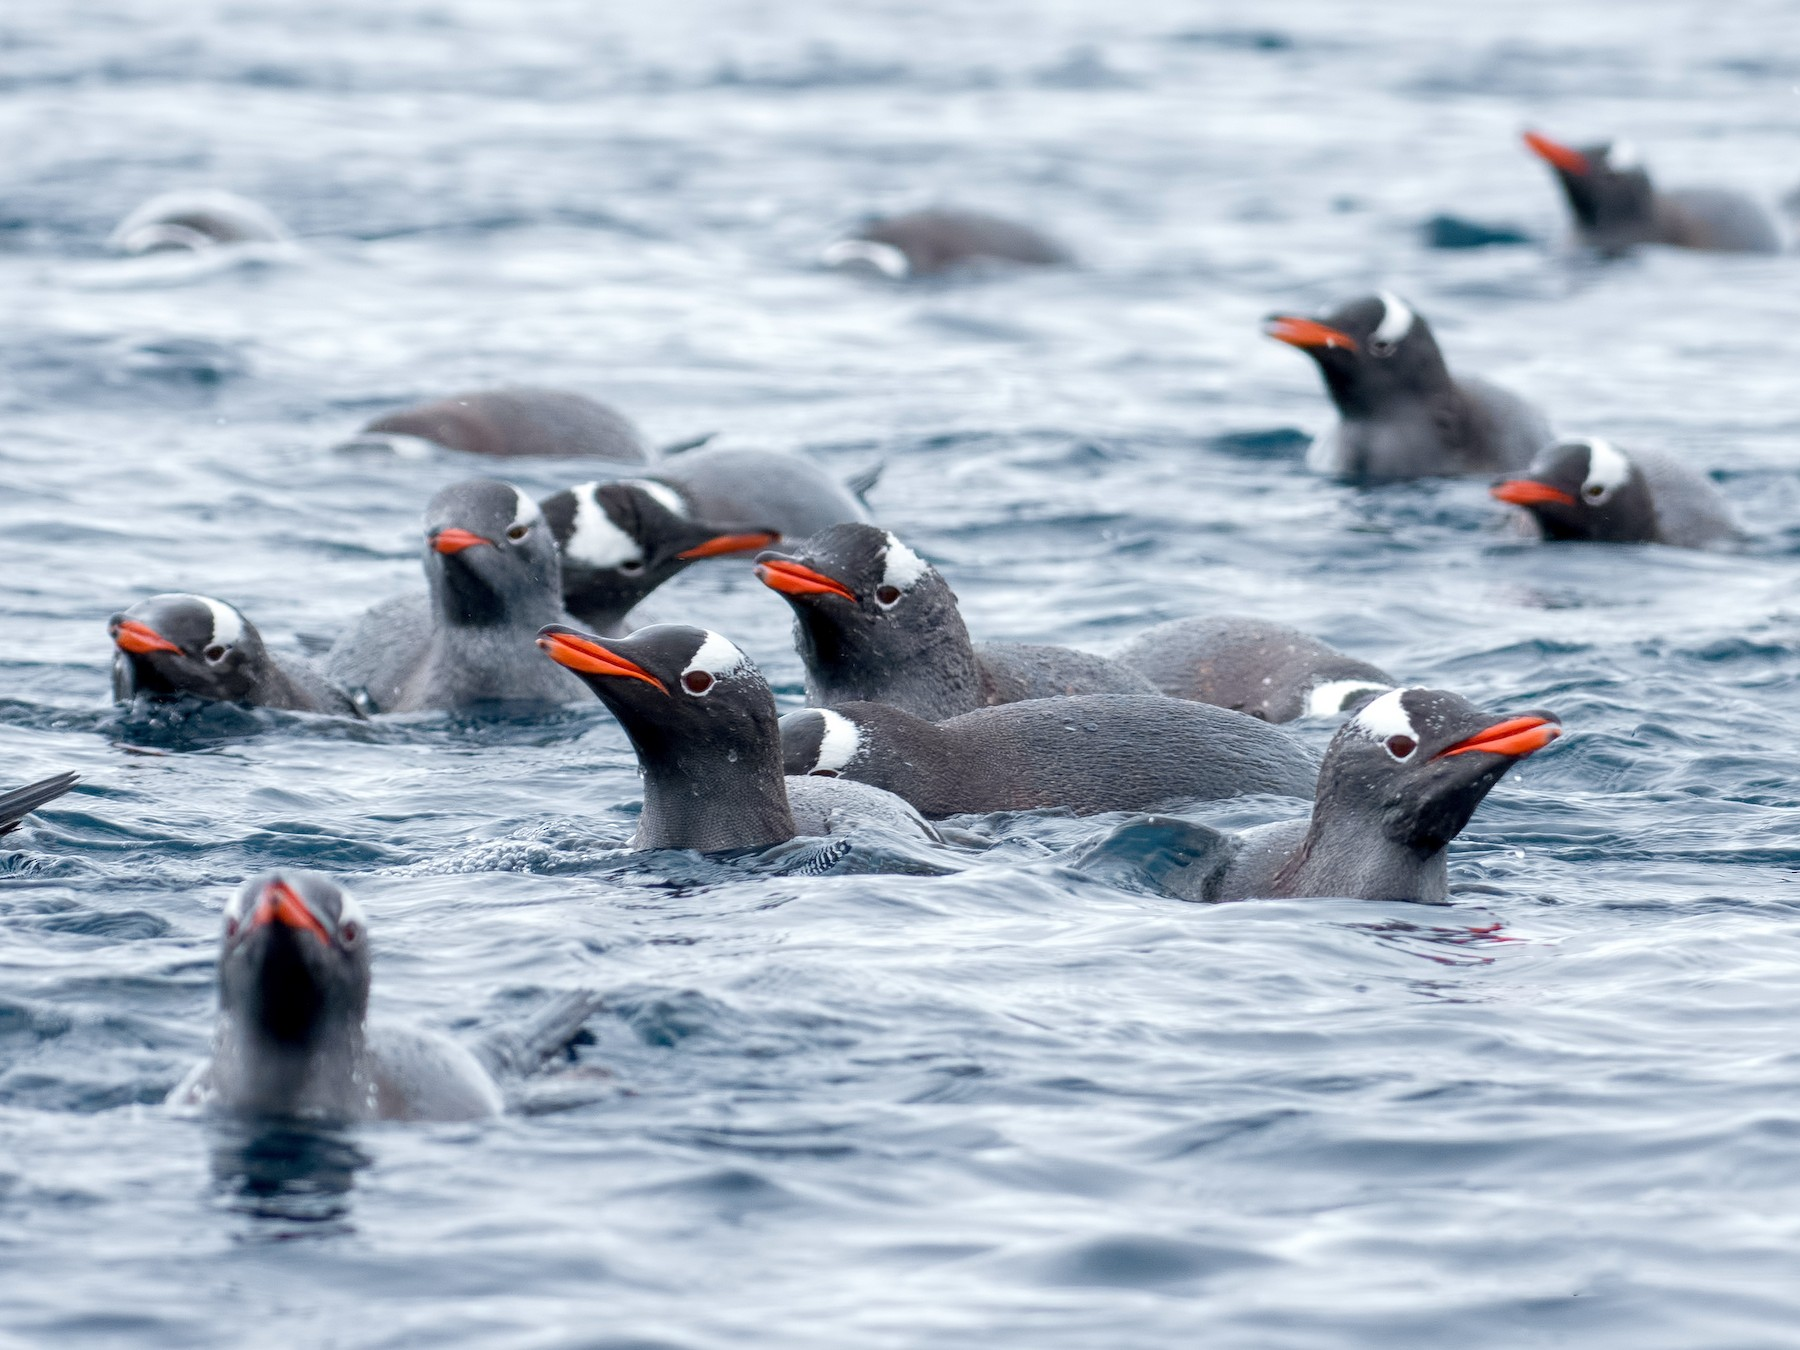 Gentoo Penguin - Shailesh Pinto